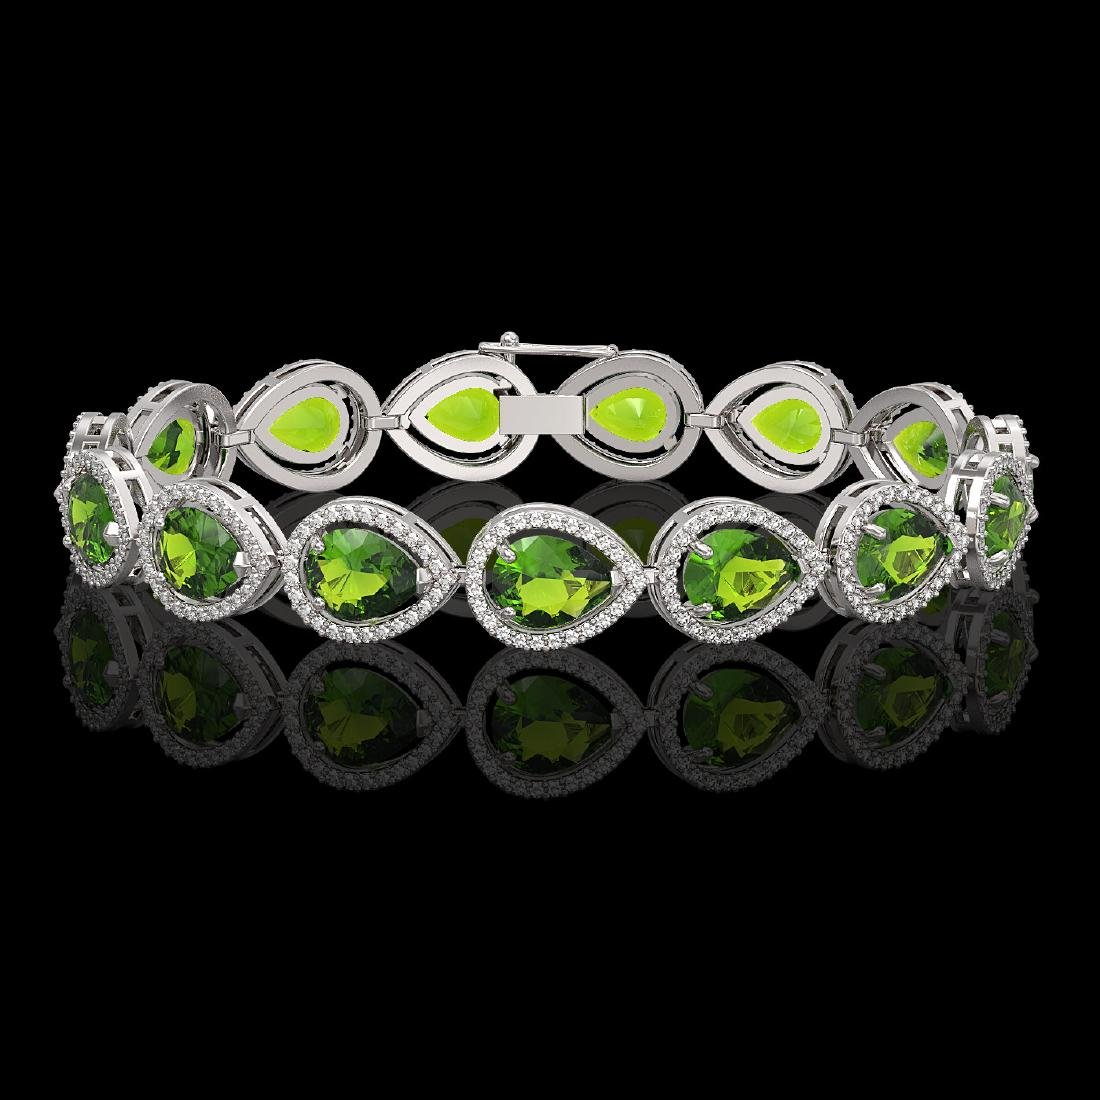 15.8 CTW Peridot & Diamond Halo Bracelet 10K White Gold